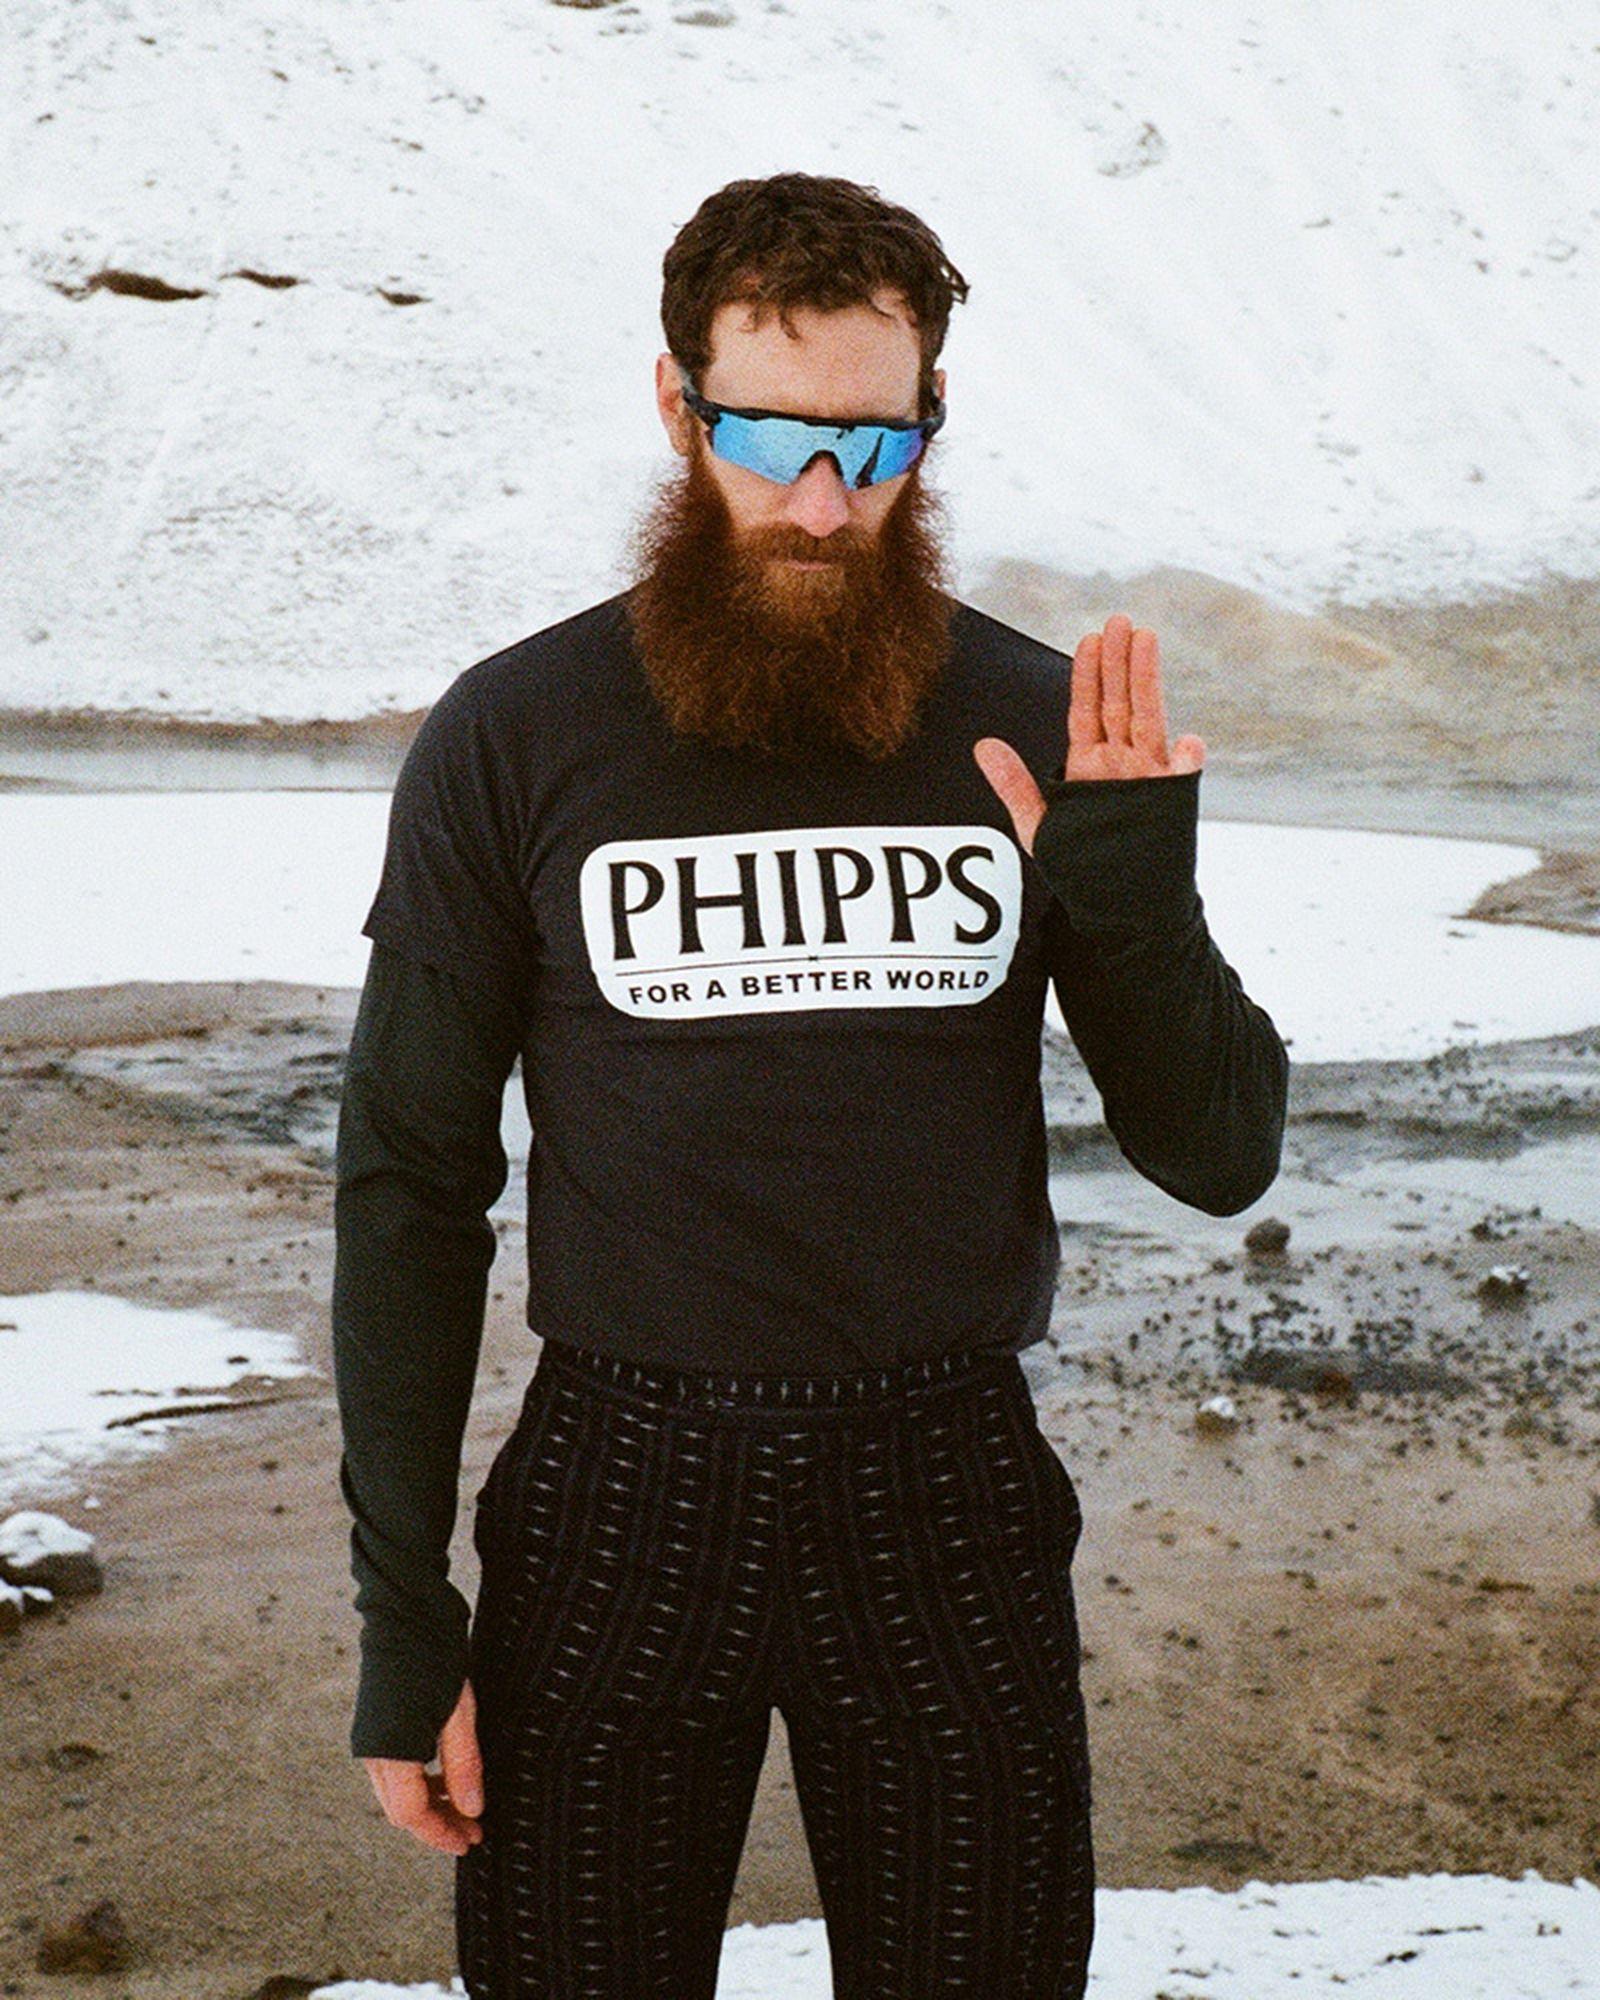 spencer-phipps-interview-002